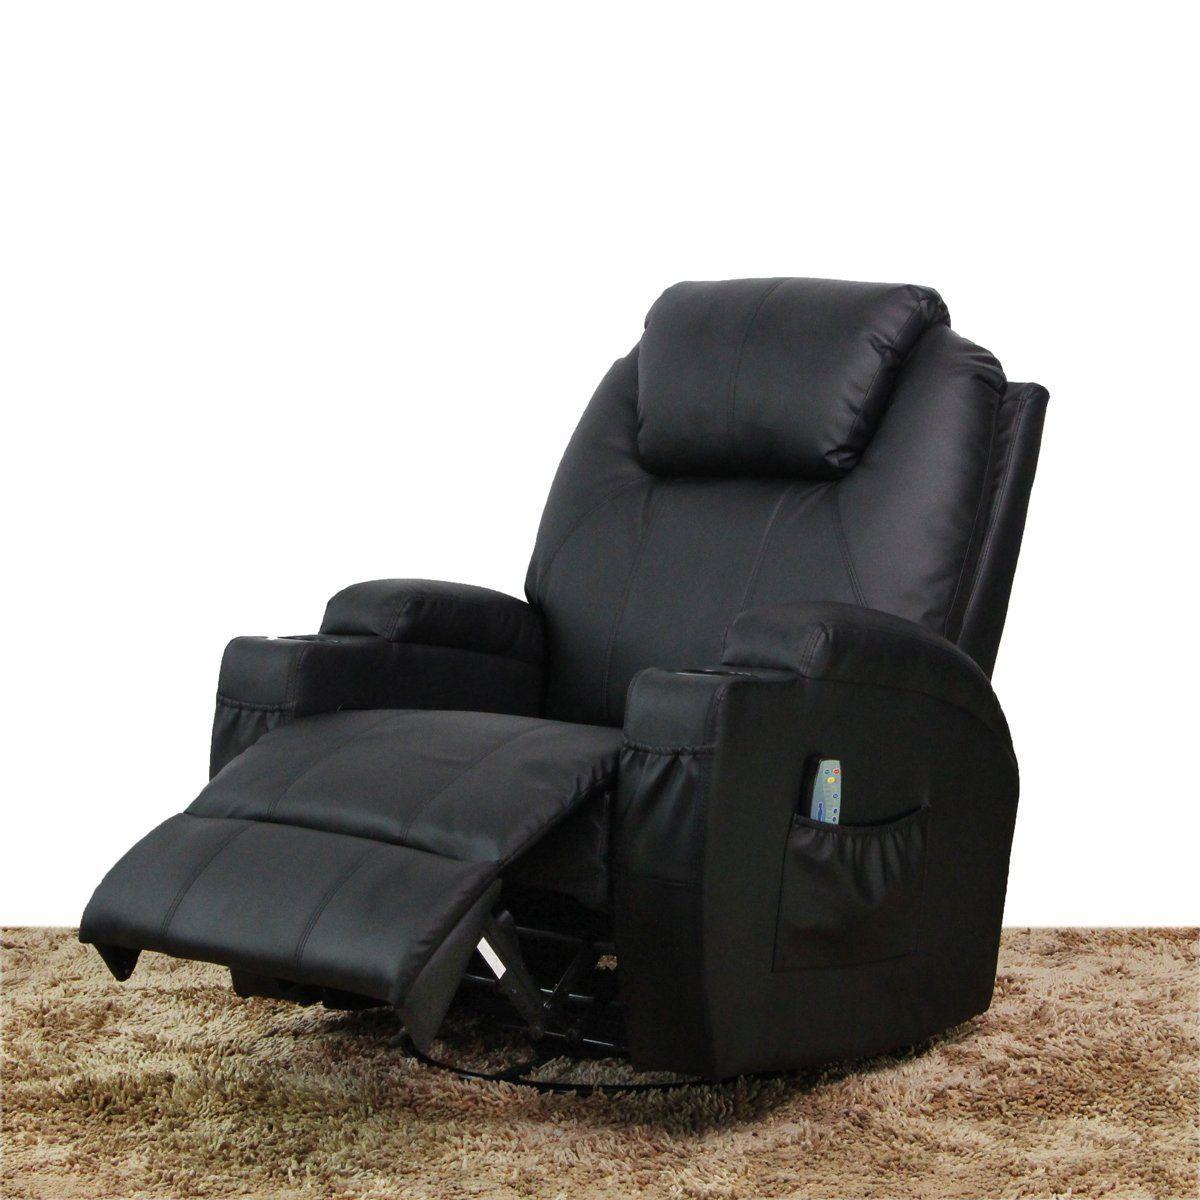 Esright massage recliner chair heated pu leather ergonomic